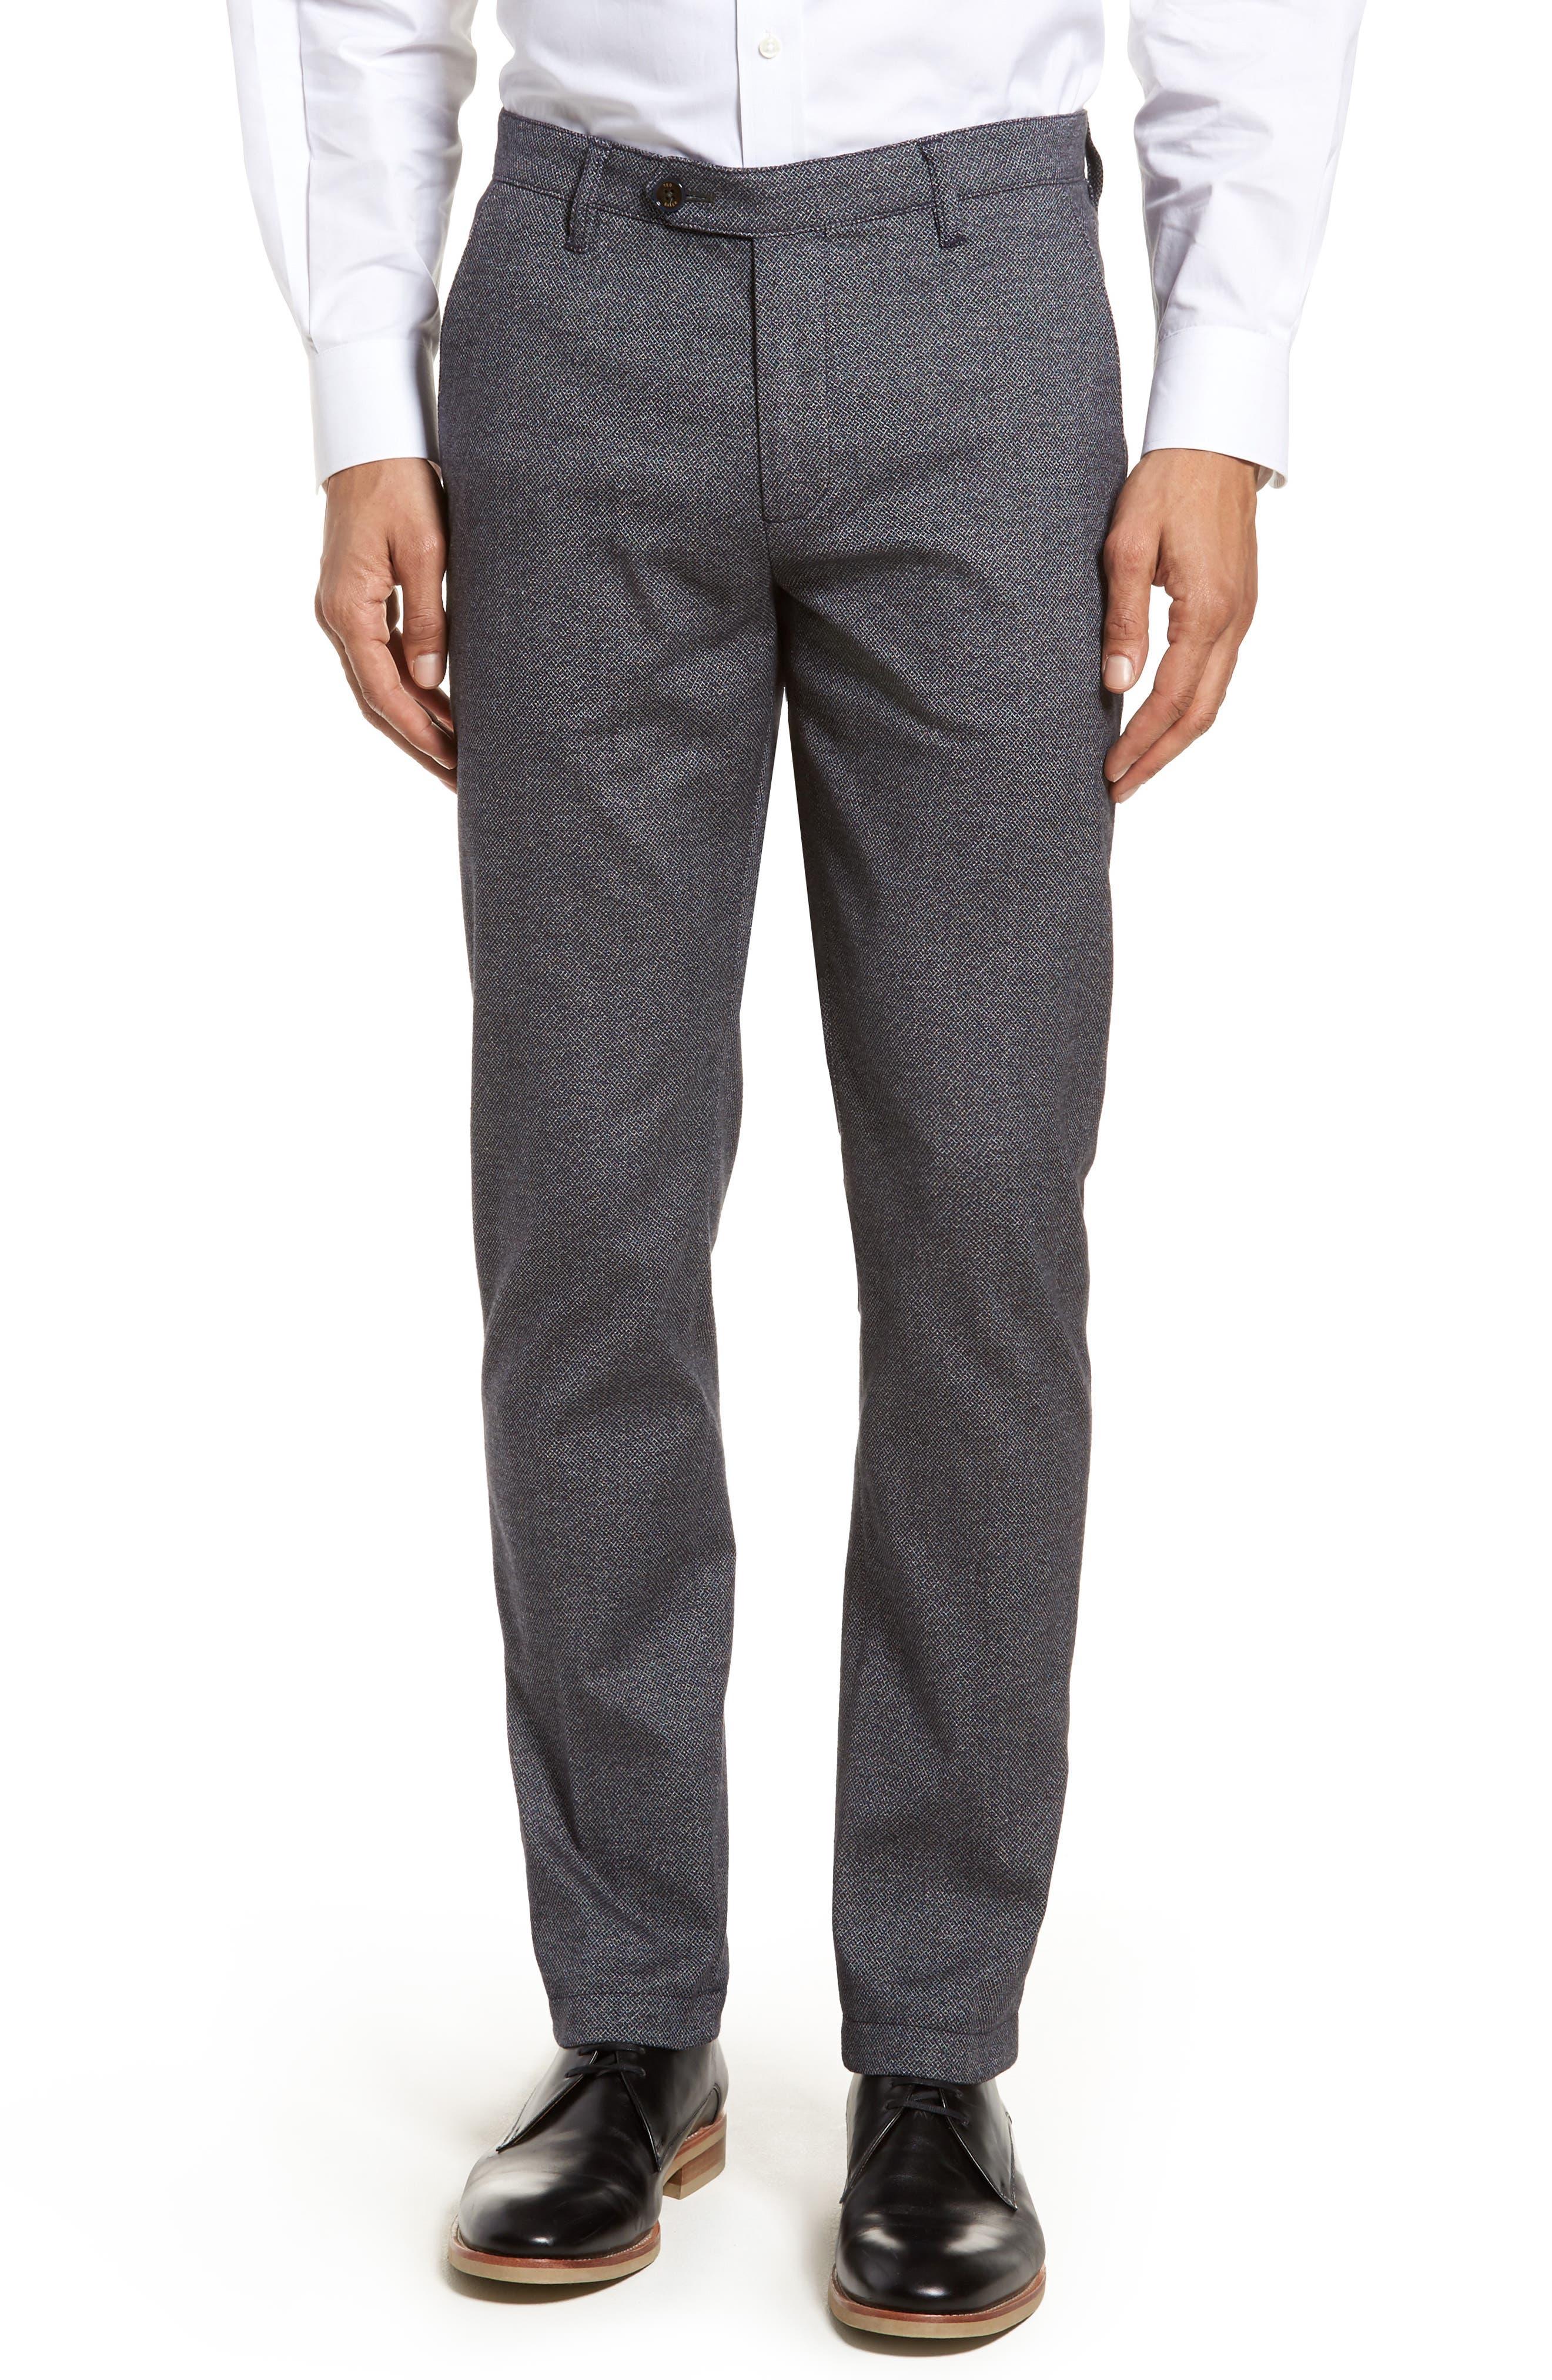 Pintz Slim Fit Trousers,                             Main thumbnail 1, color,                             Navy